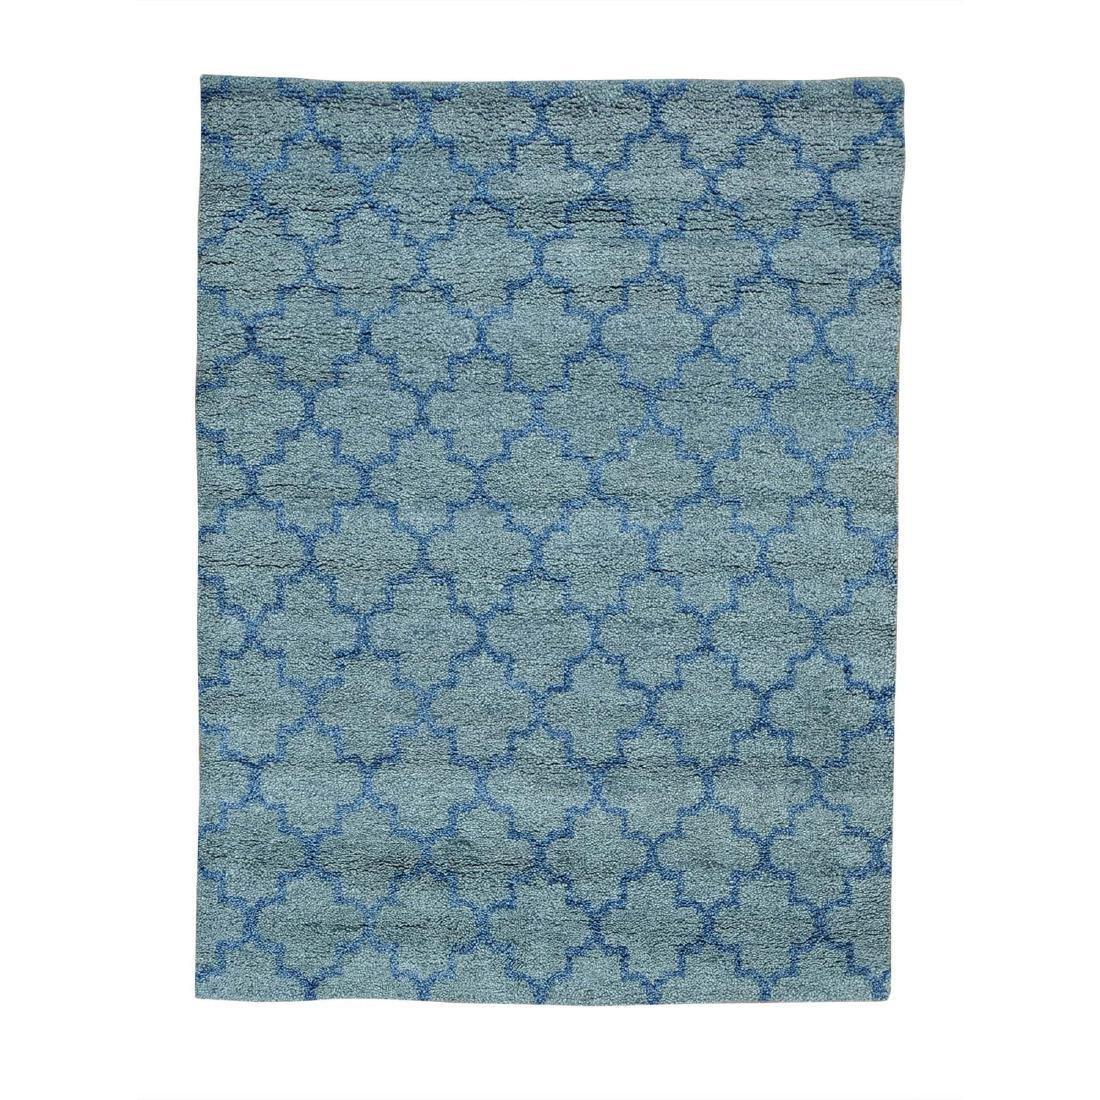 Handmade Pure Wool Grey Moroccan Berber Rug 5.1x6.9